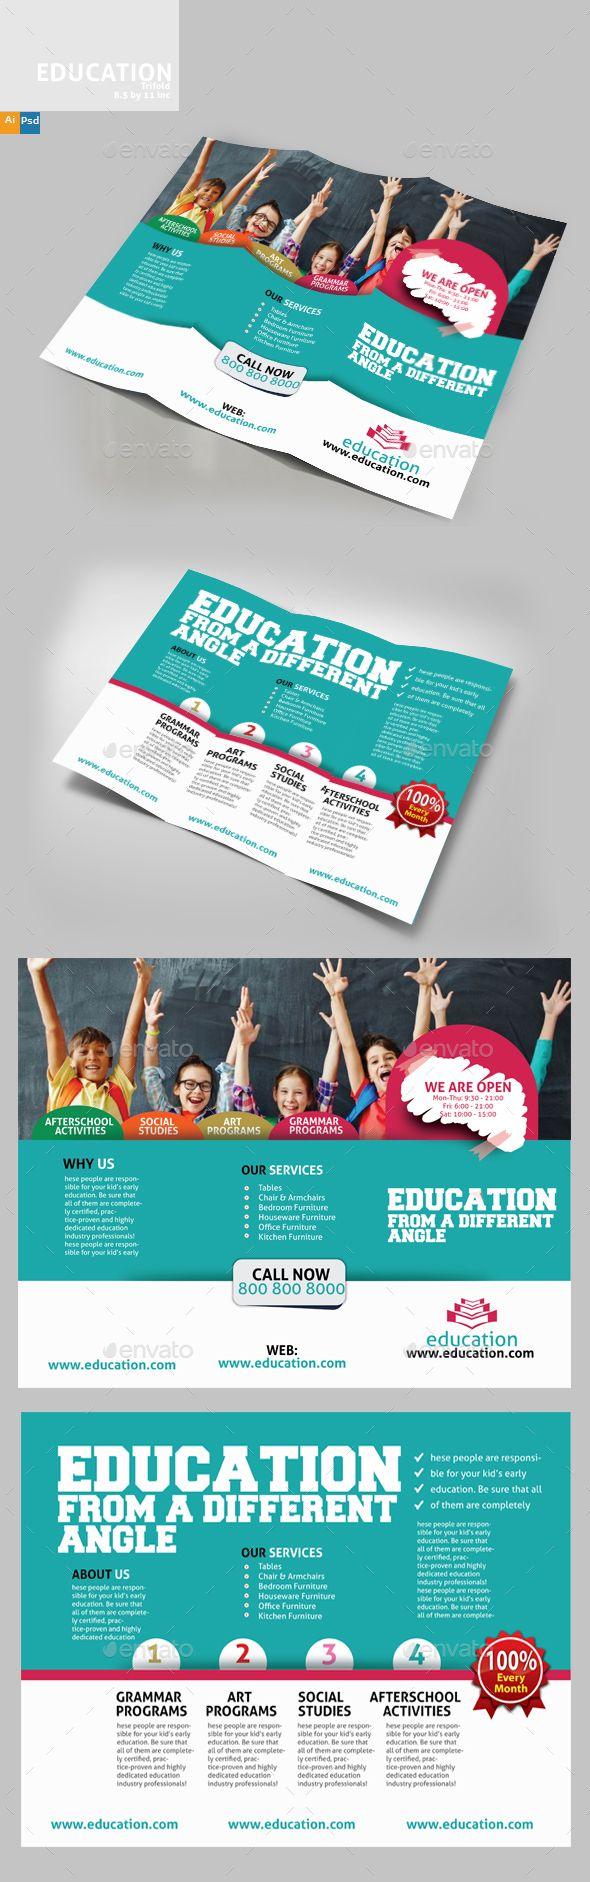 Education Three Fold Brochure Template PSD, Vector EPS, AI Illustrator